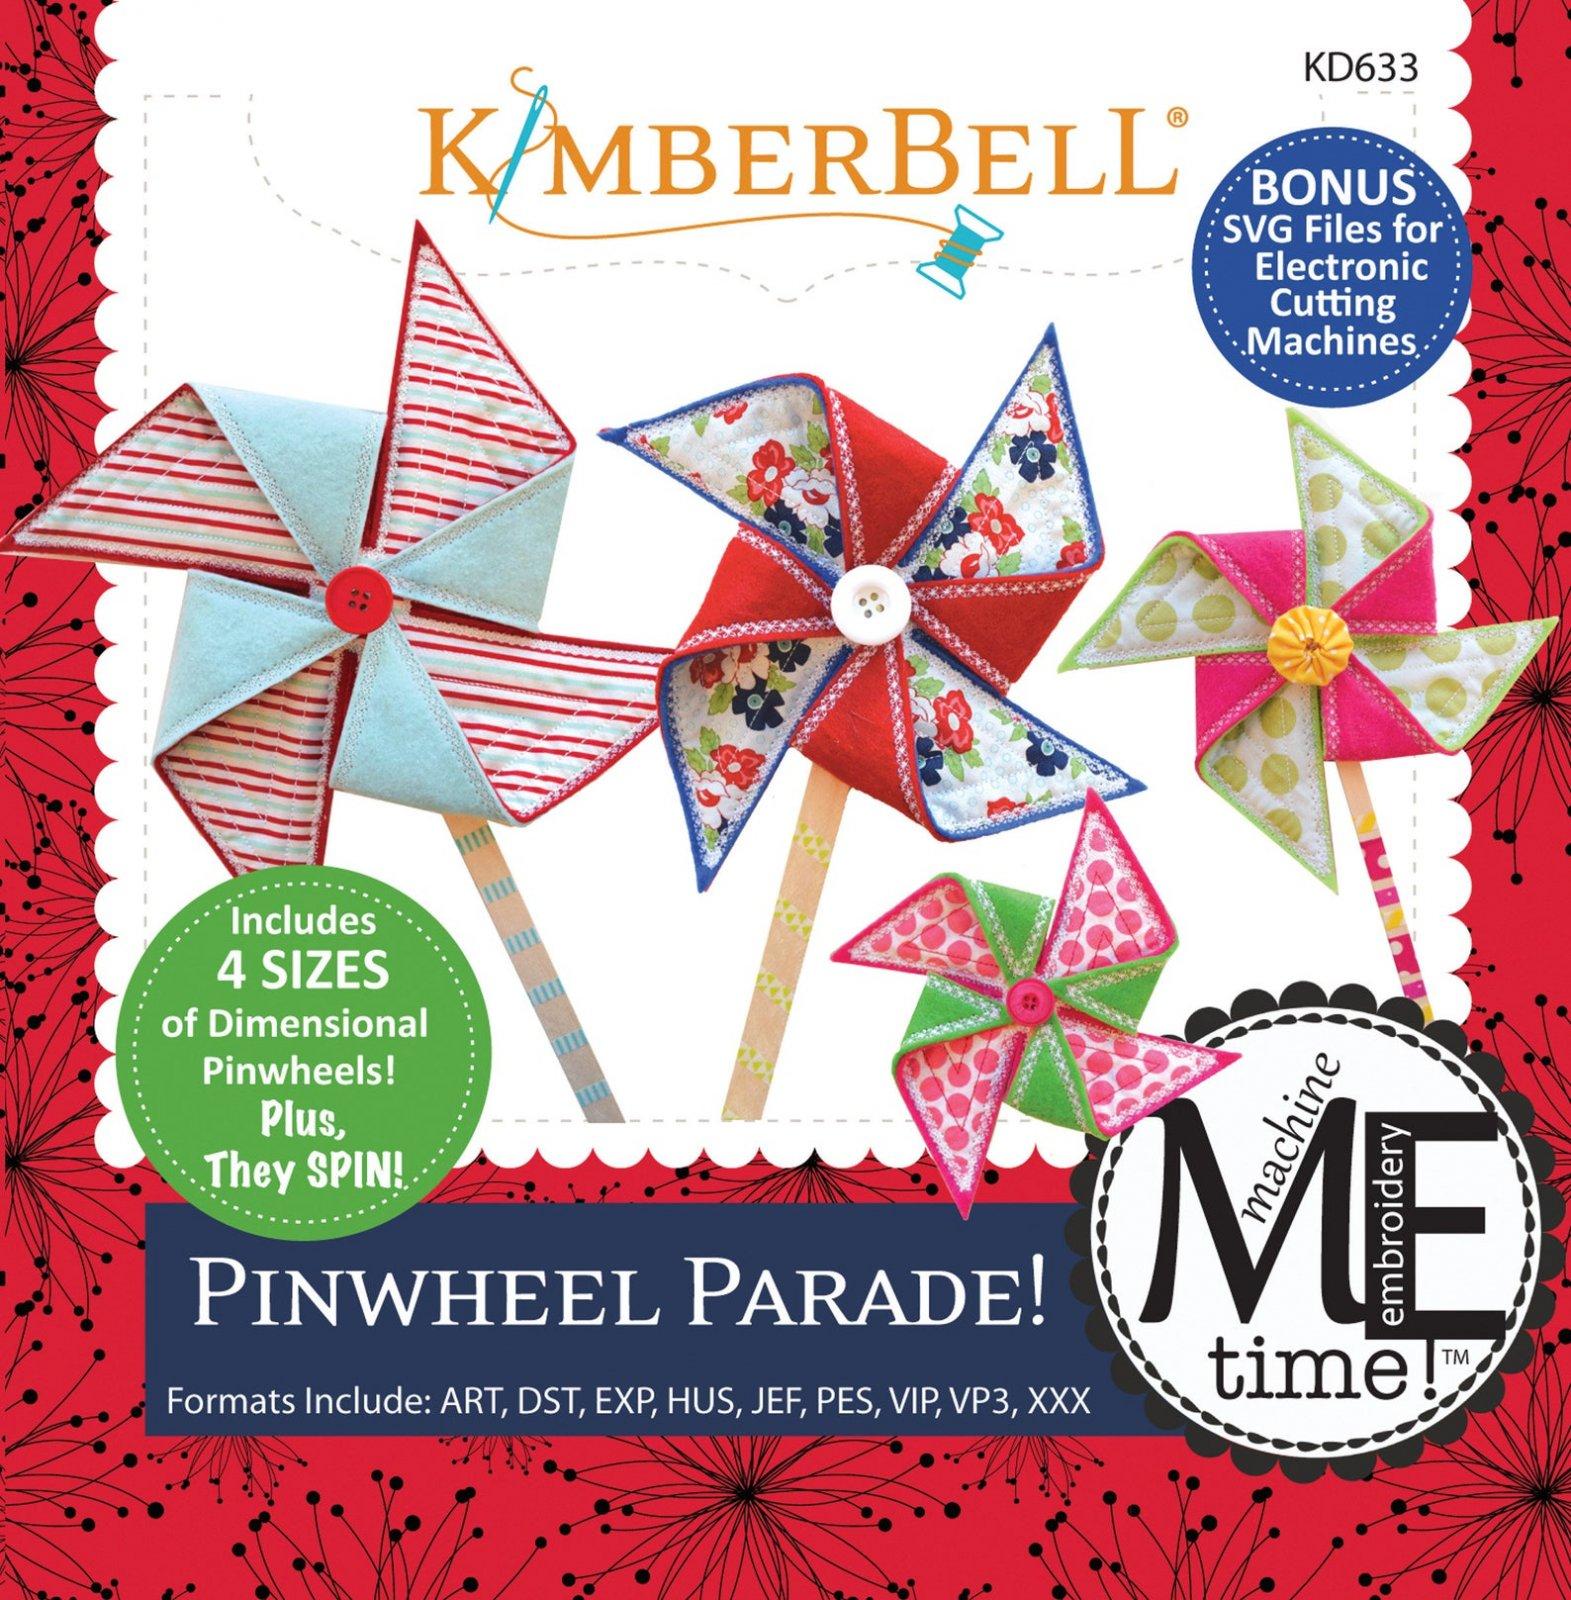 KimberBell Pinwheel Parade